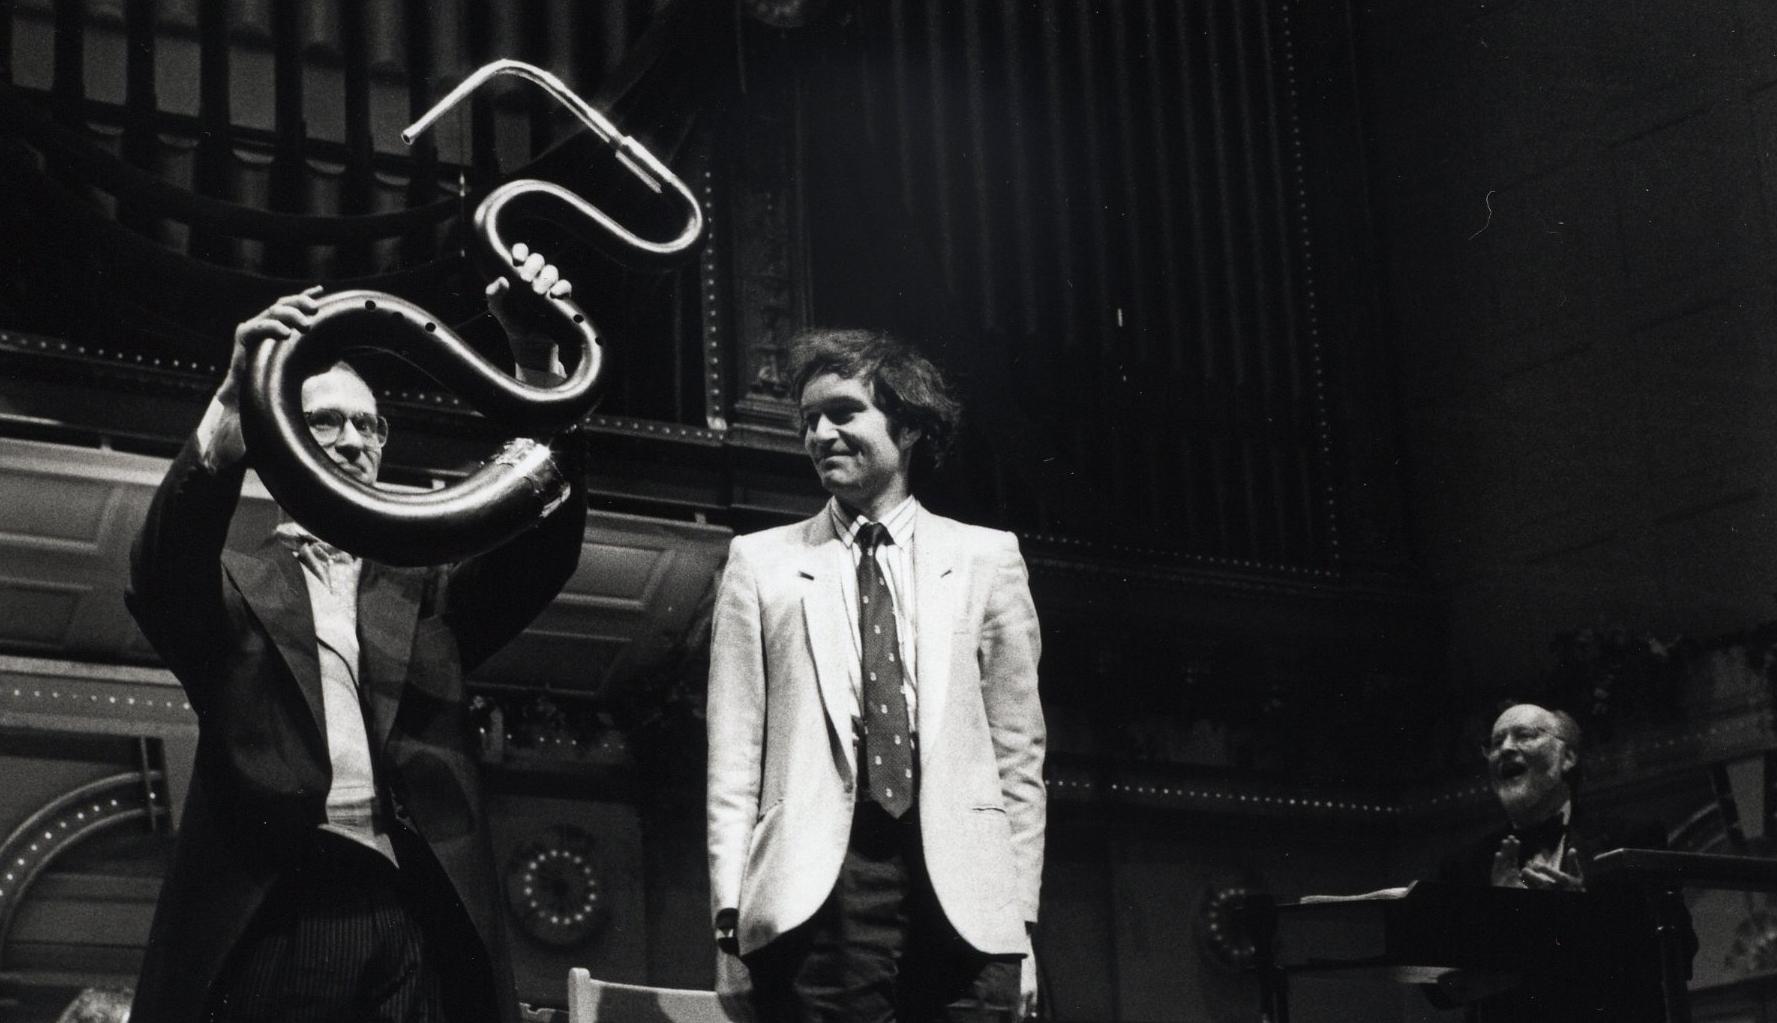 Yeo_Proctor_Williams_Serpent_Concerto_1997